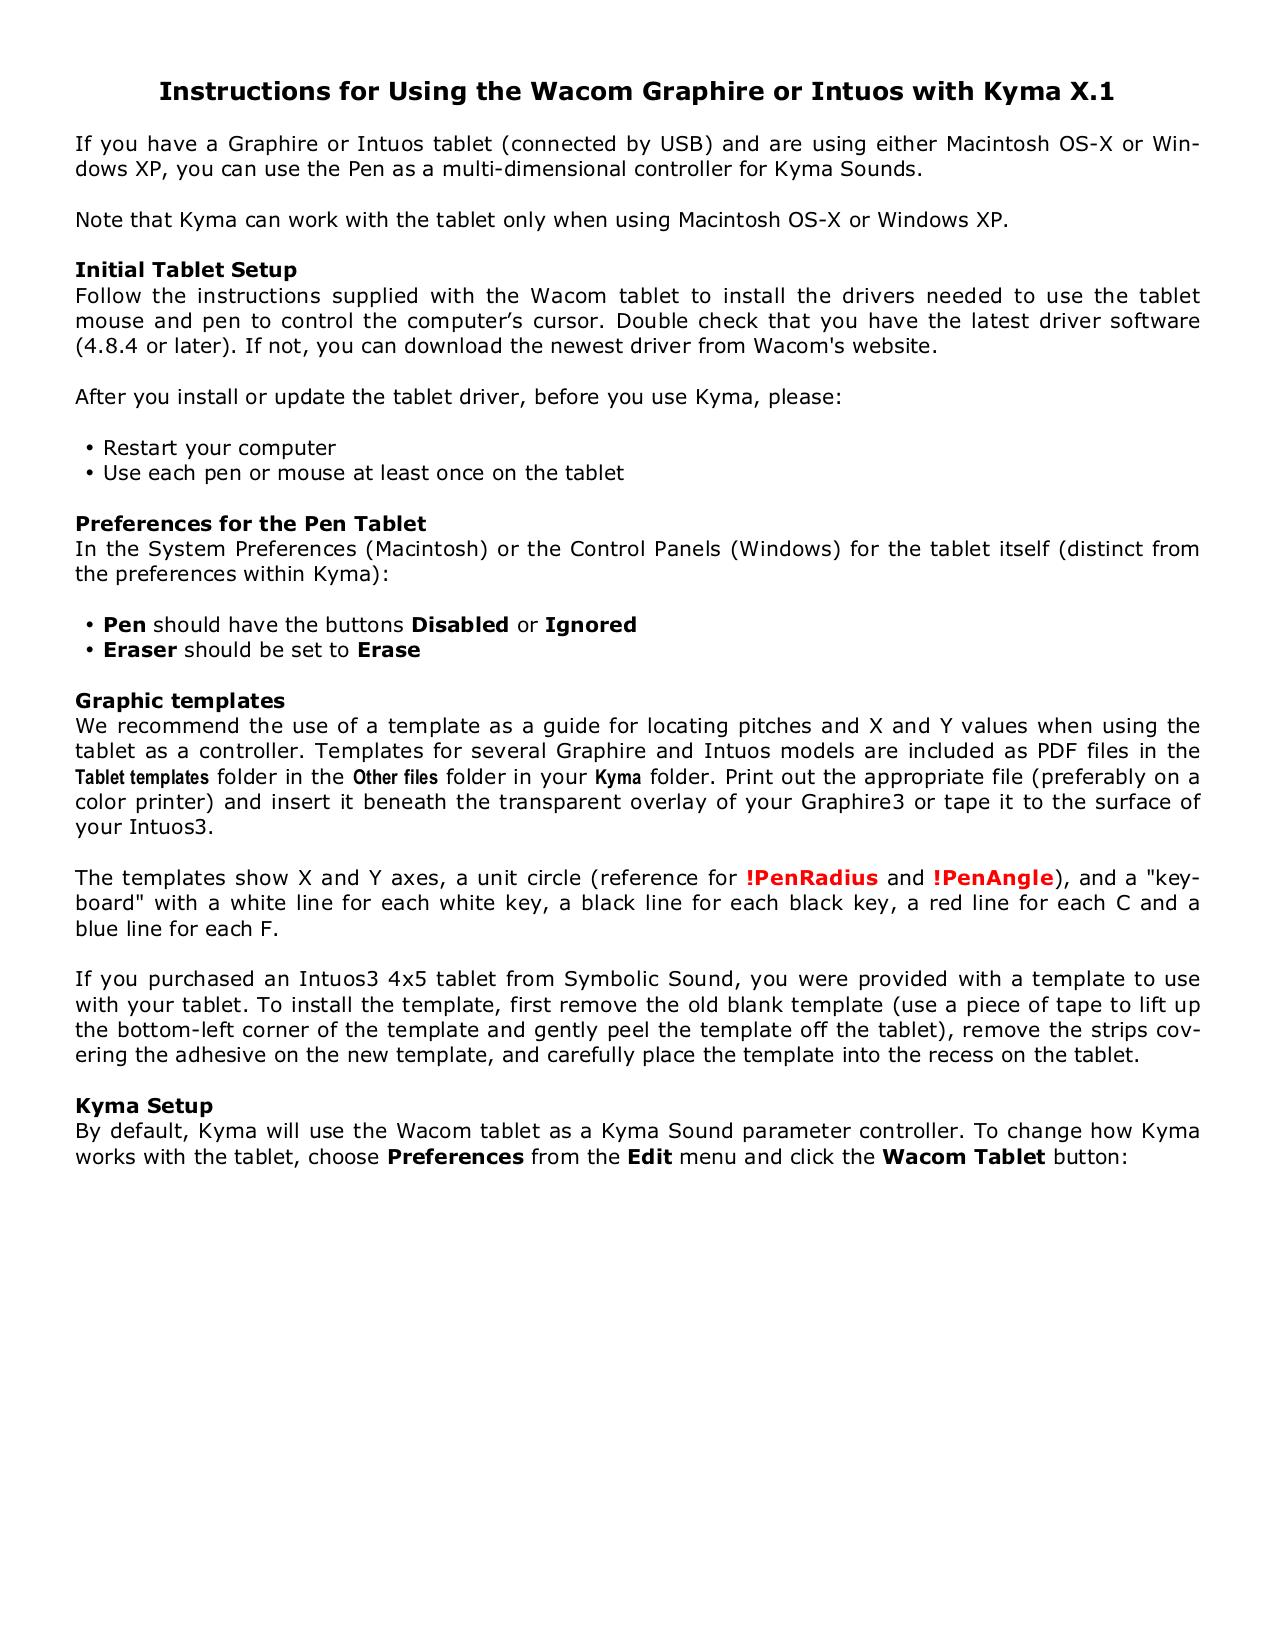 pdf for Wacom Mouse Intuos4 Mouse manual